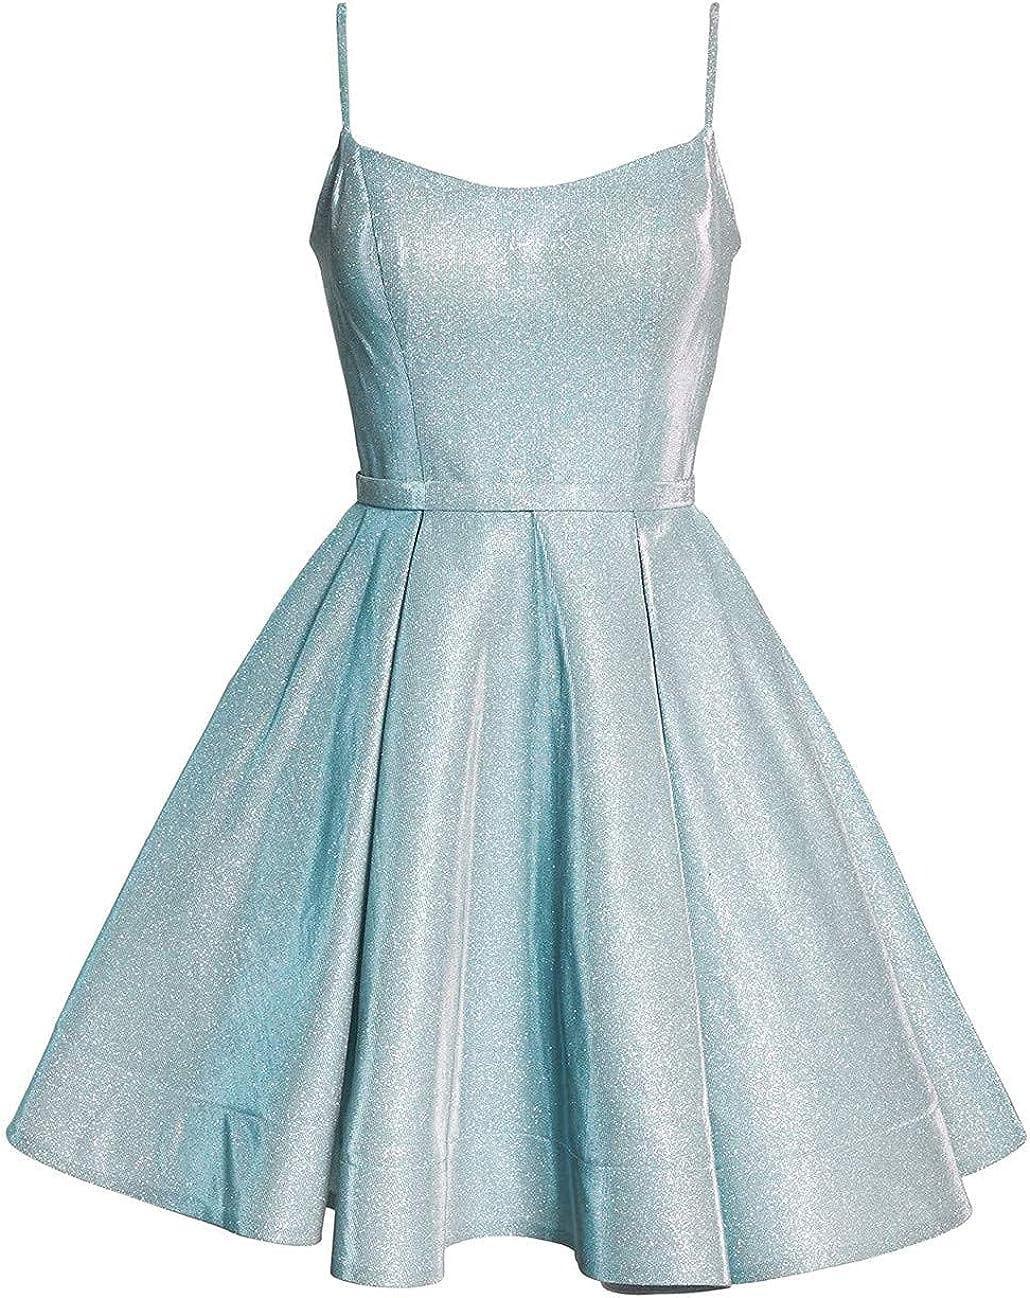 Vivian's bridal Women's Quantity limited Strap Prom Max 42% OFF Glittery Satin Dress Sh